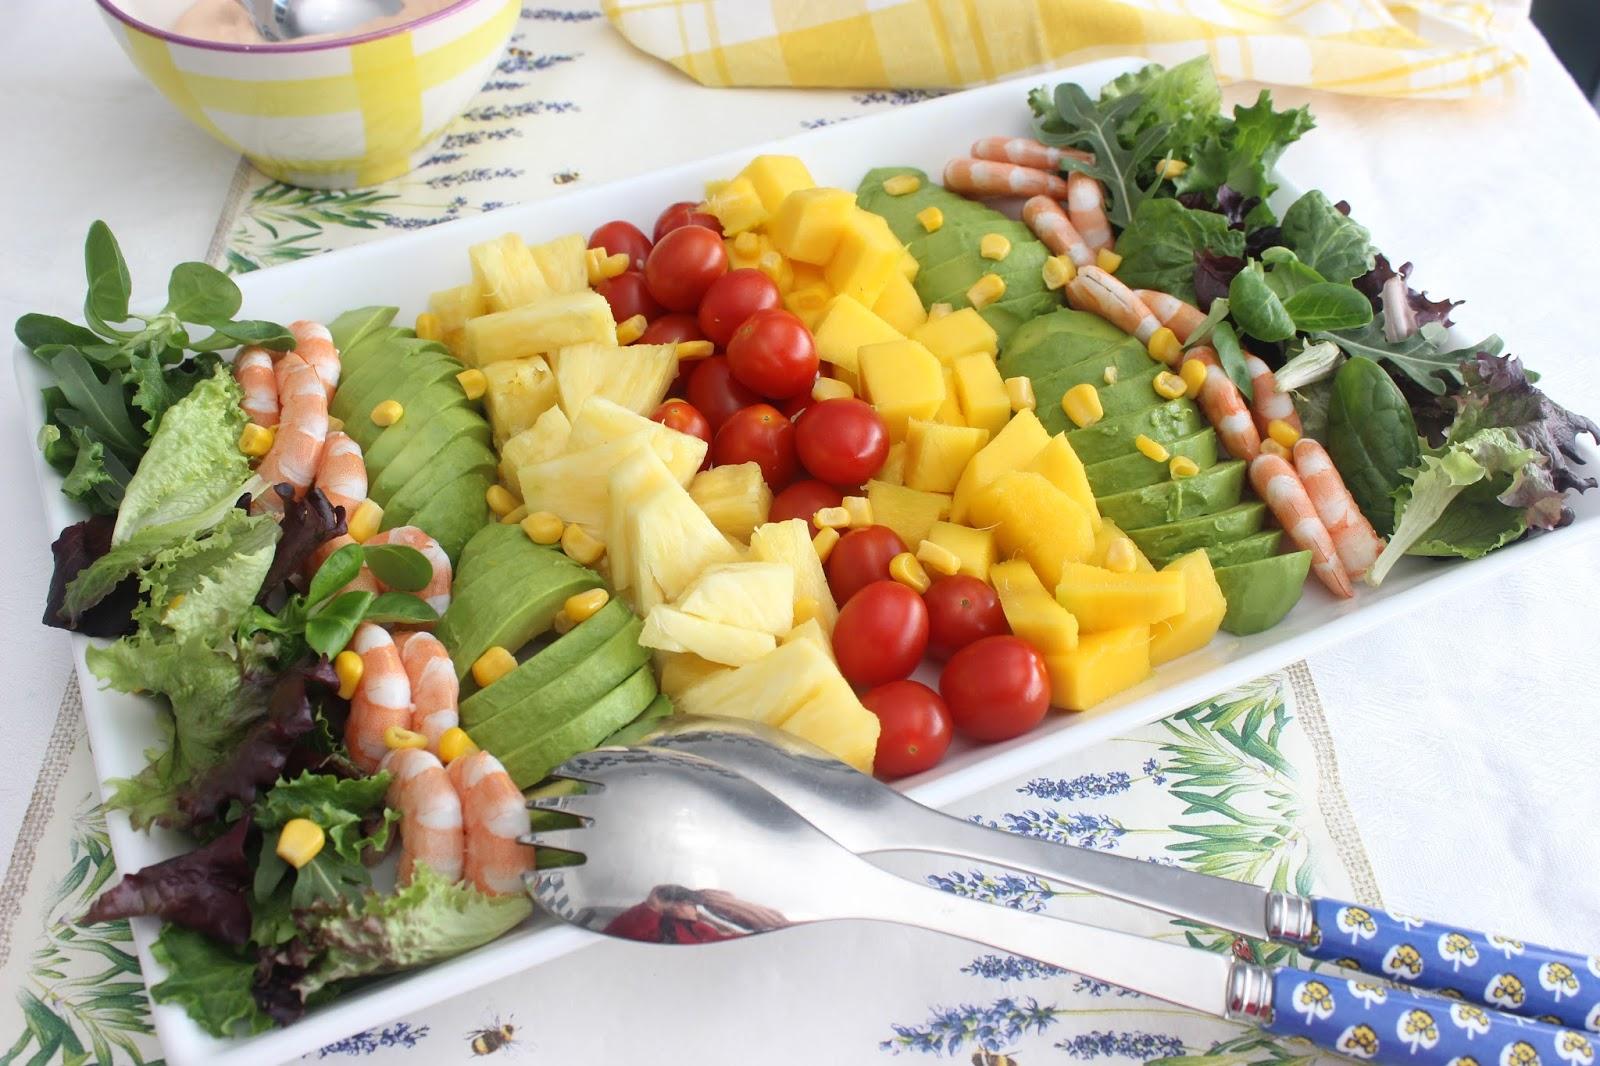 Ensalada tropical con langostinos las recetas de marichu for Comidas frescas